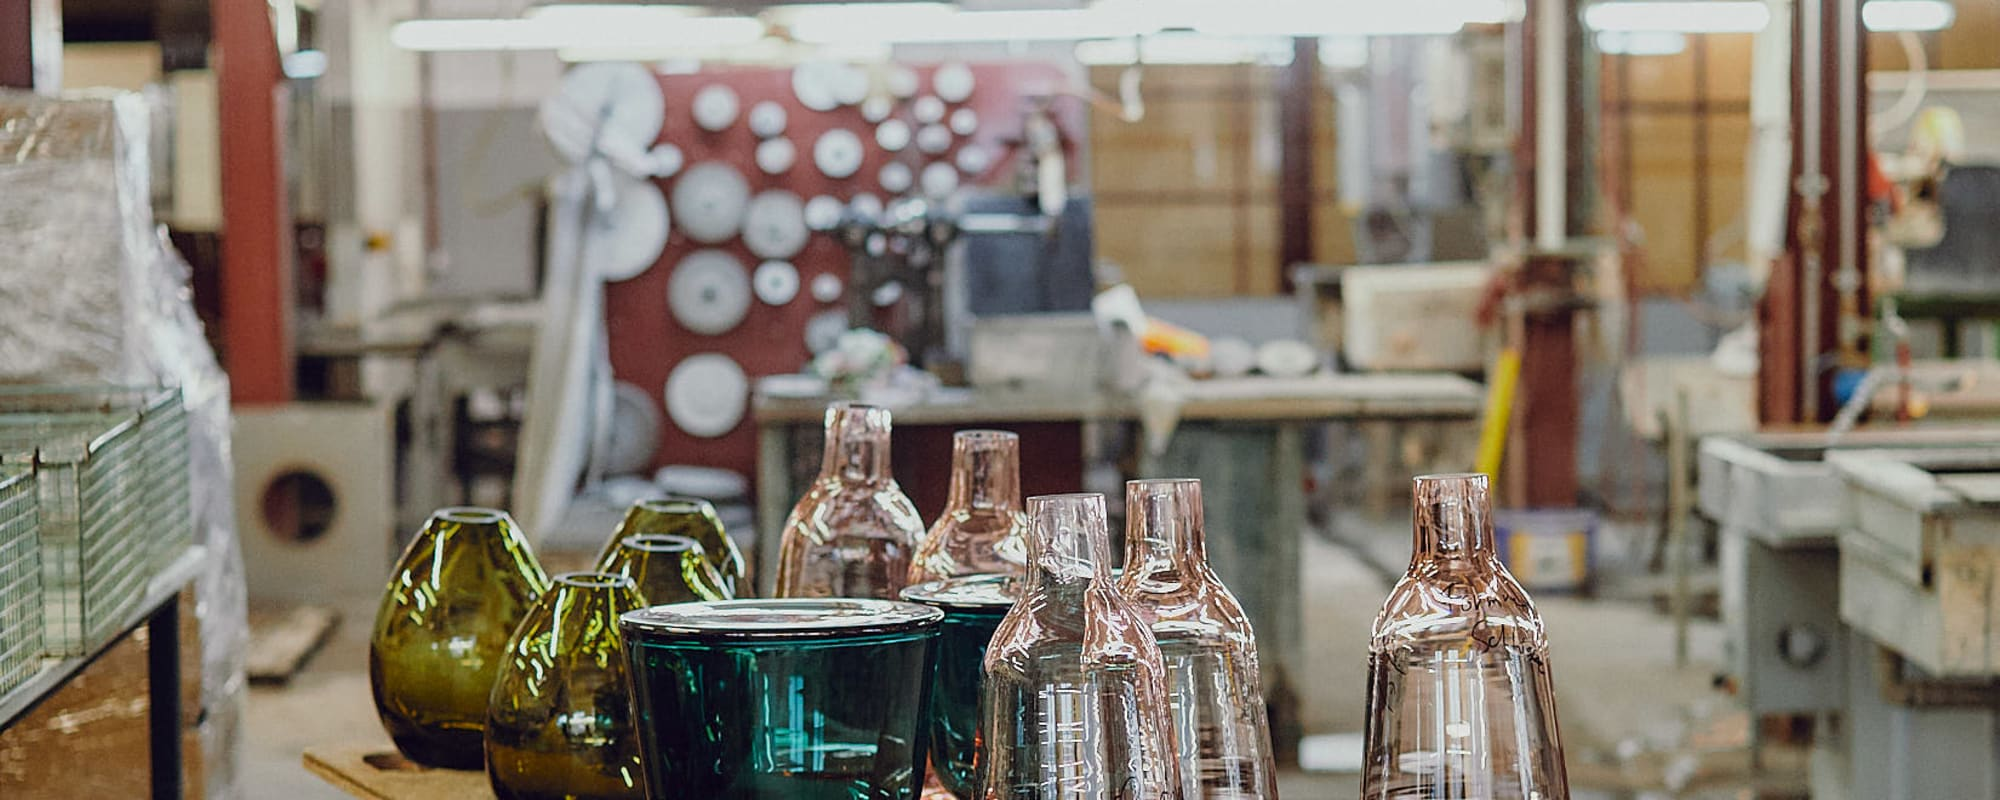 Poschinger, Glaswerkstatt